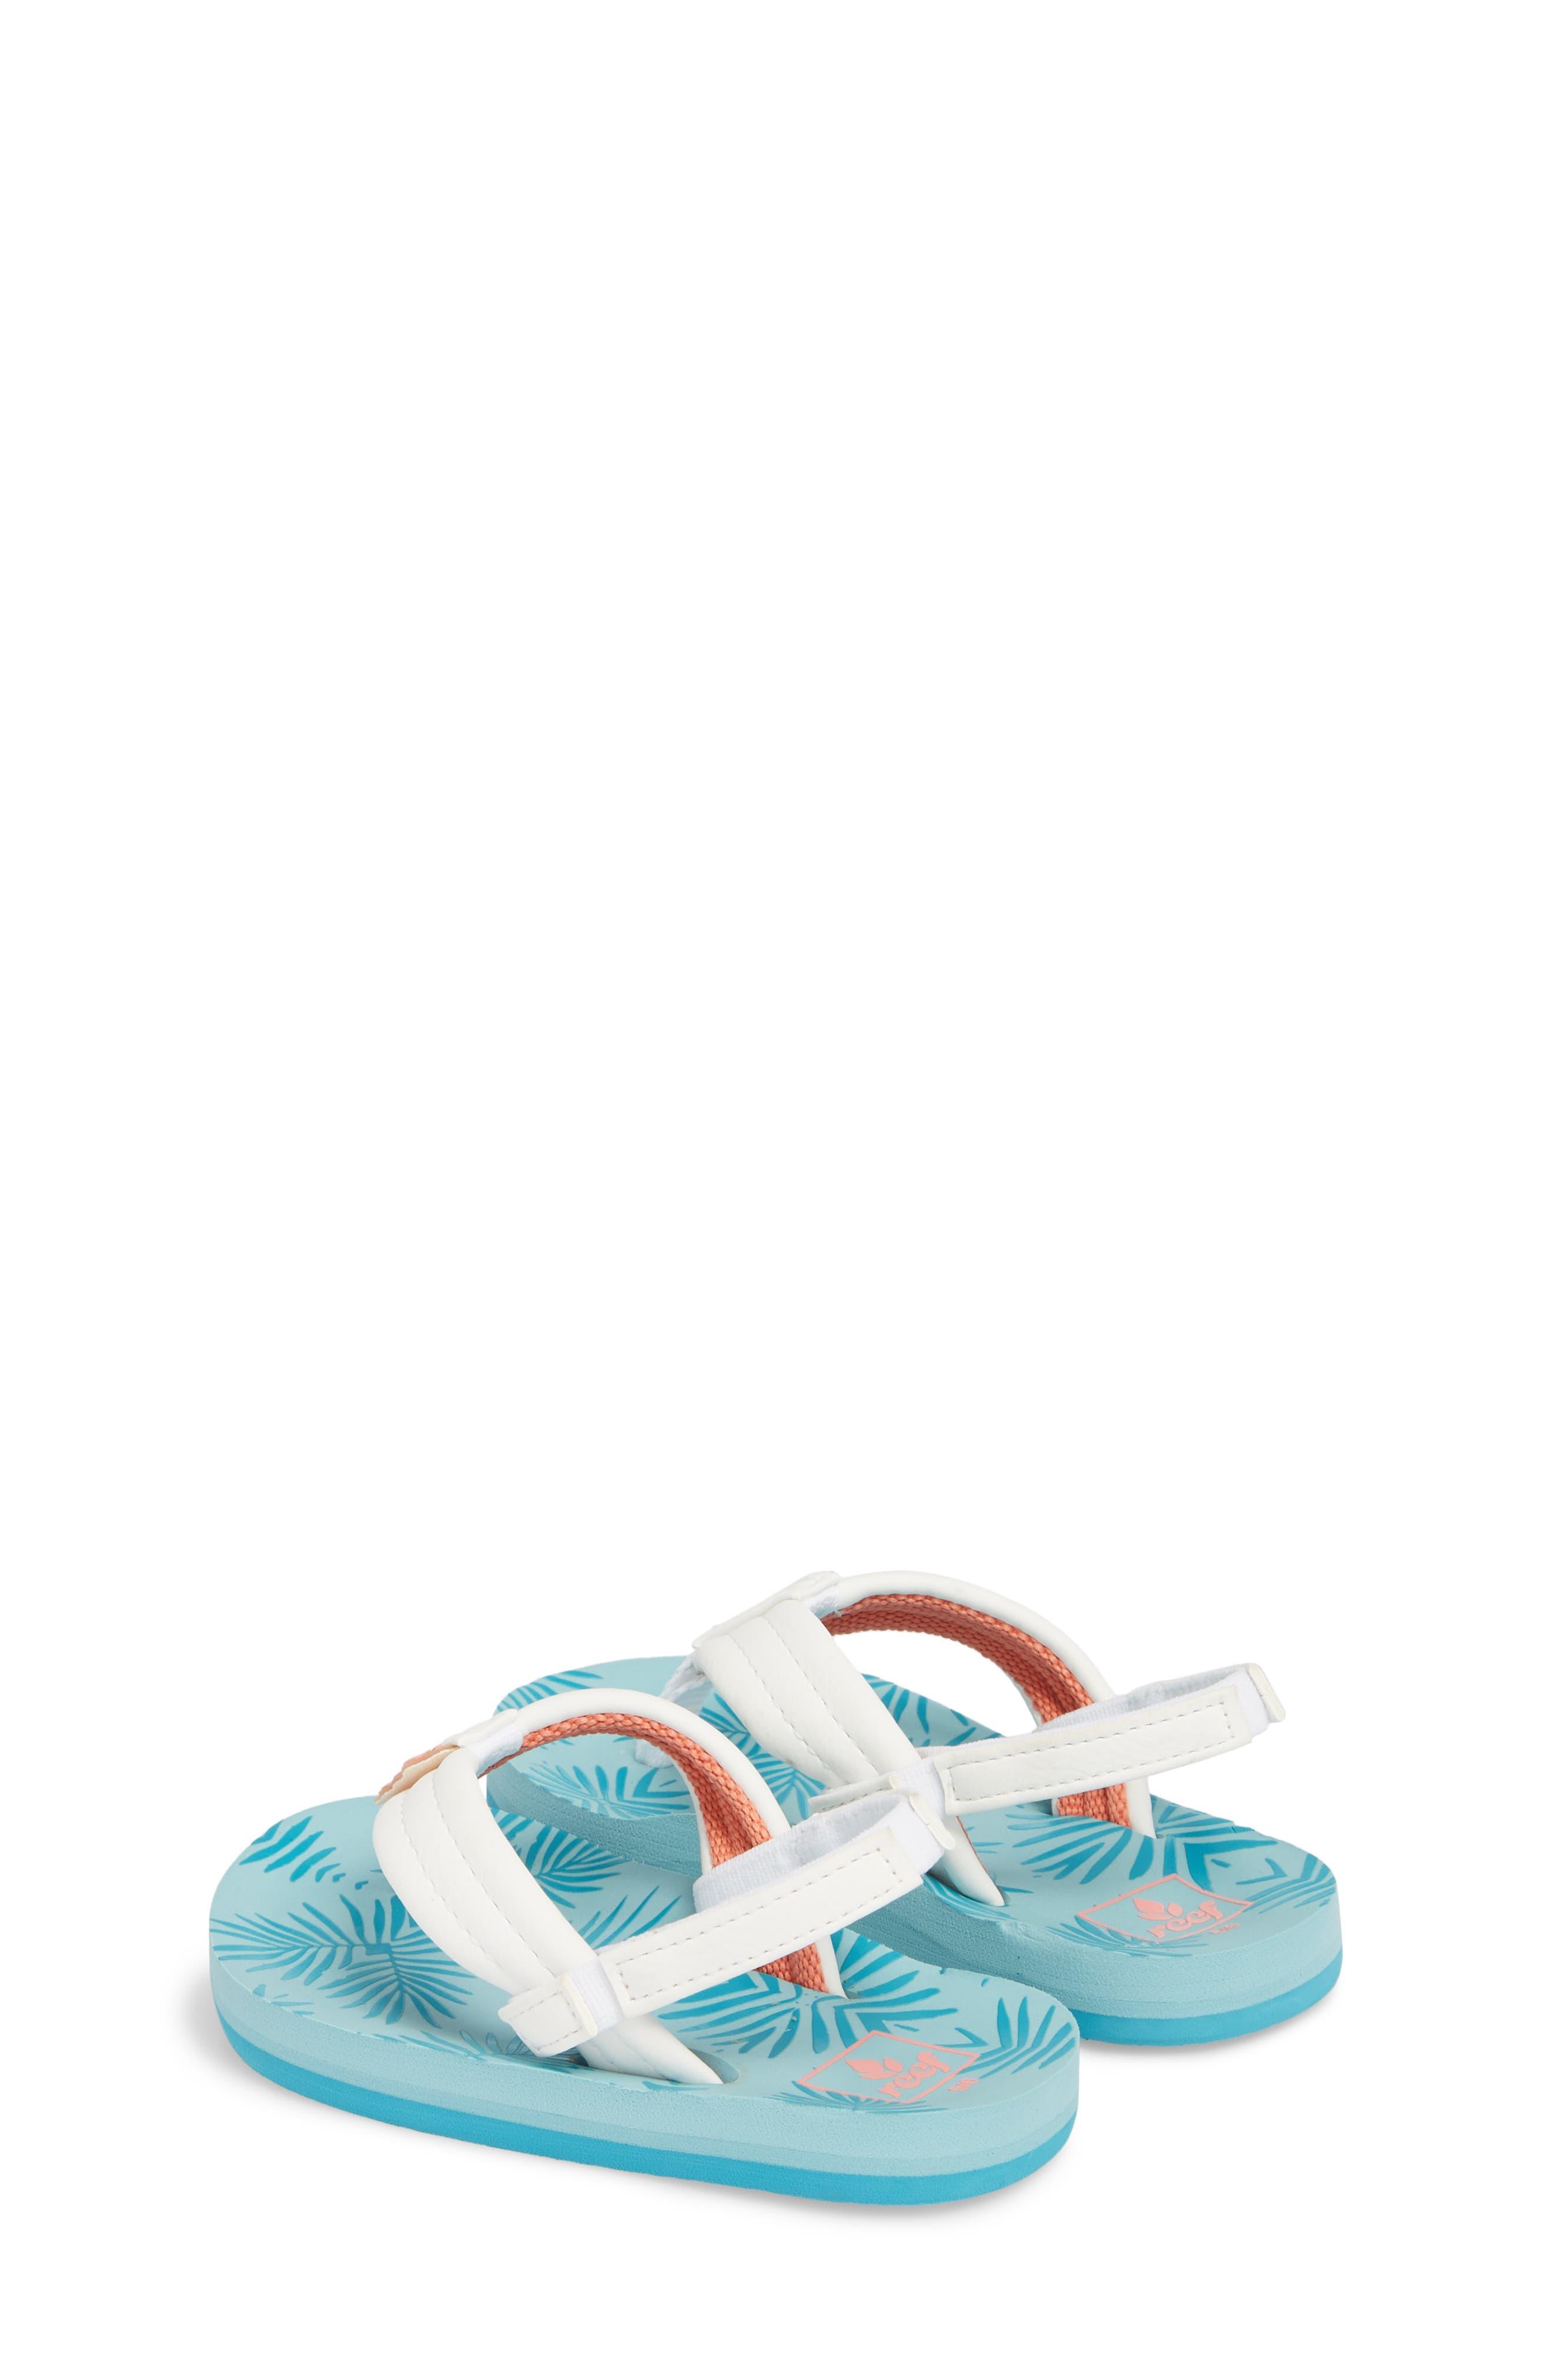 Little Reef Footprints Sandal,                             Alternate thumbnail 3, color,                             403